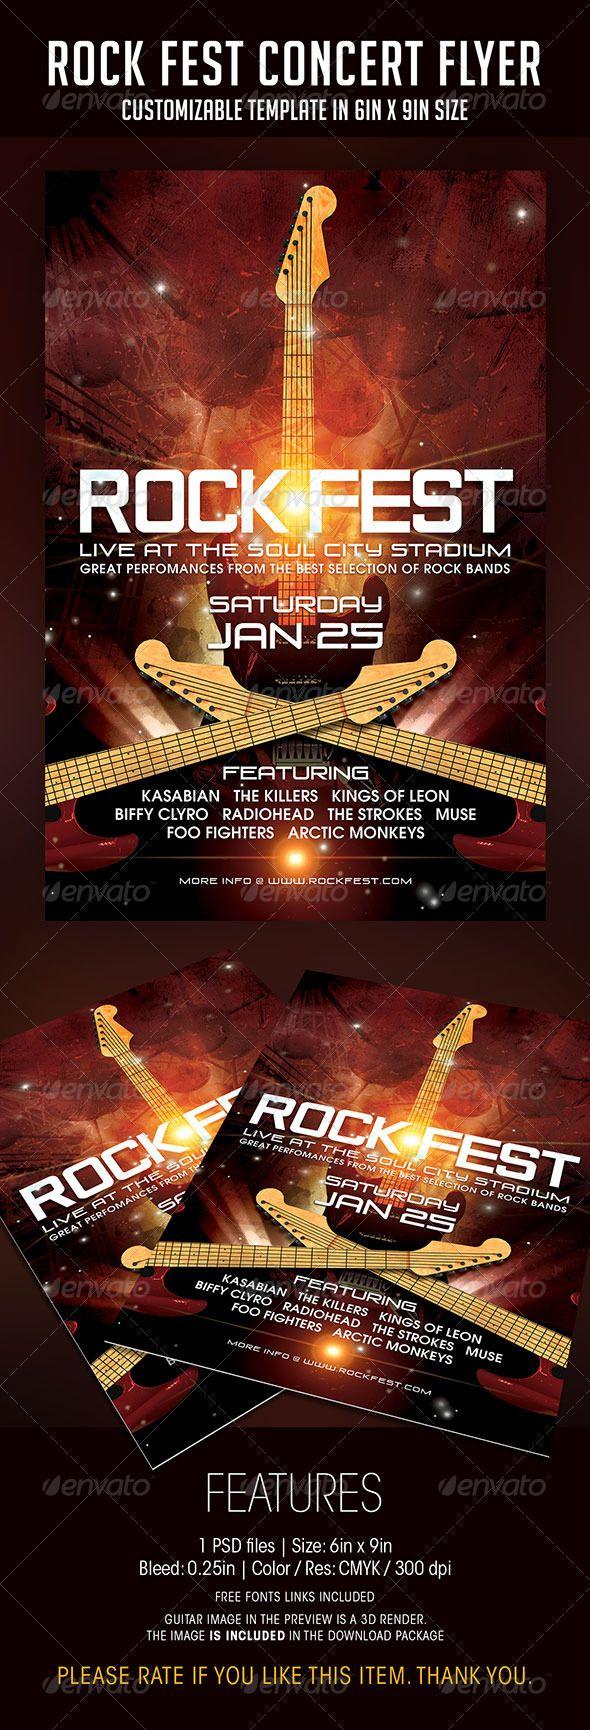 Rock Fest Concert Flyer Graphicriver Rock Fest Concert Flyer